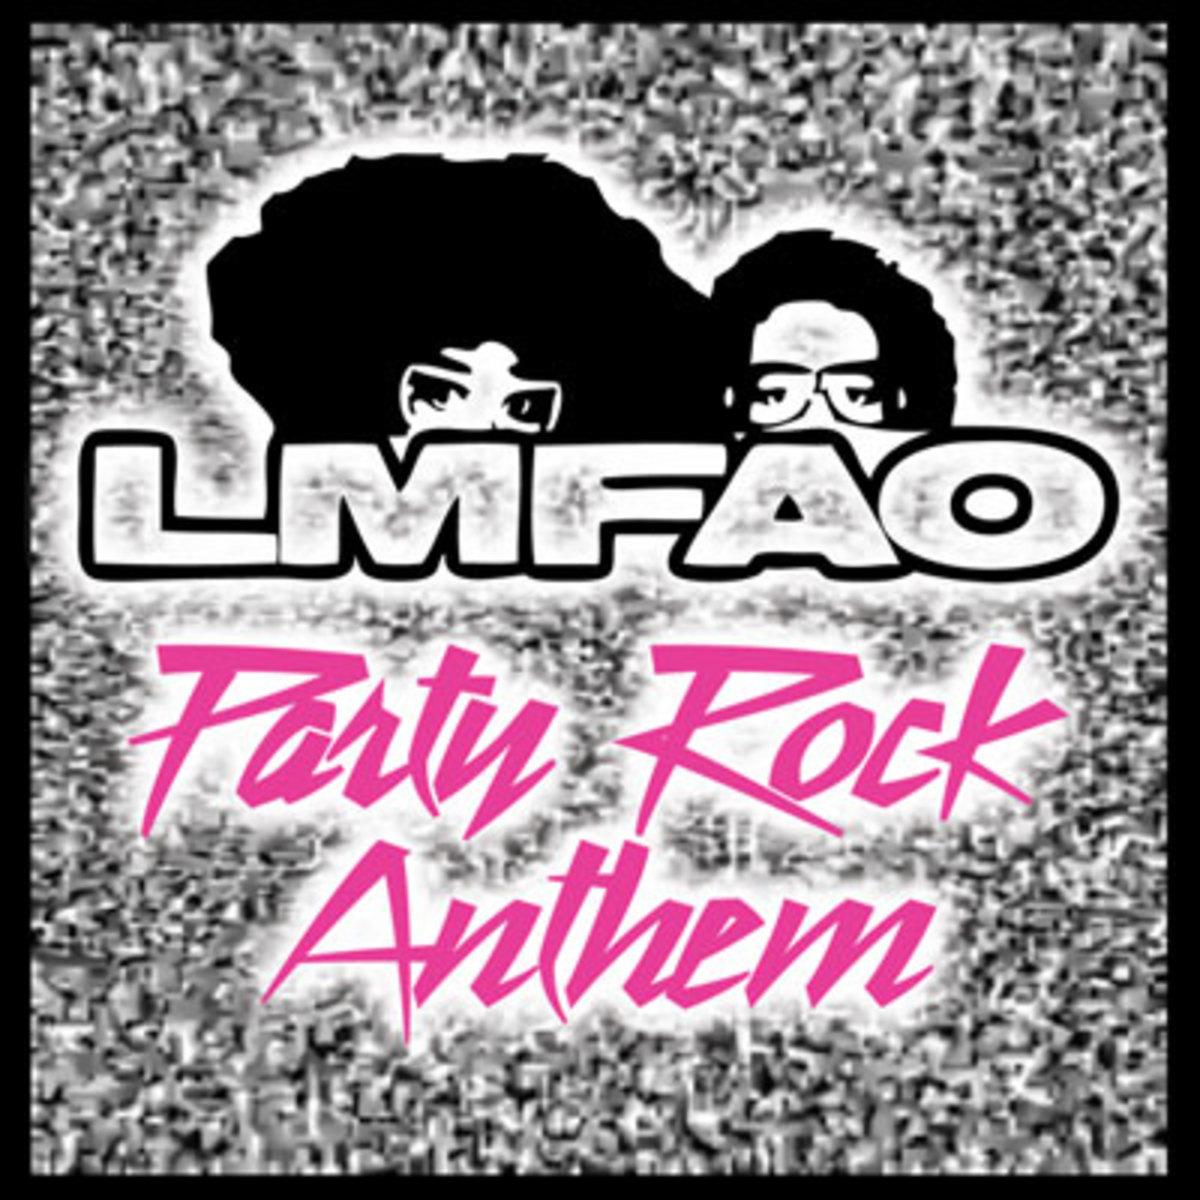 lmfao-partyrockanthem.jpg